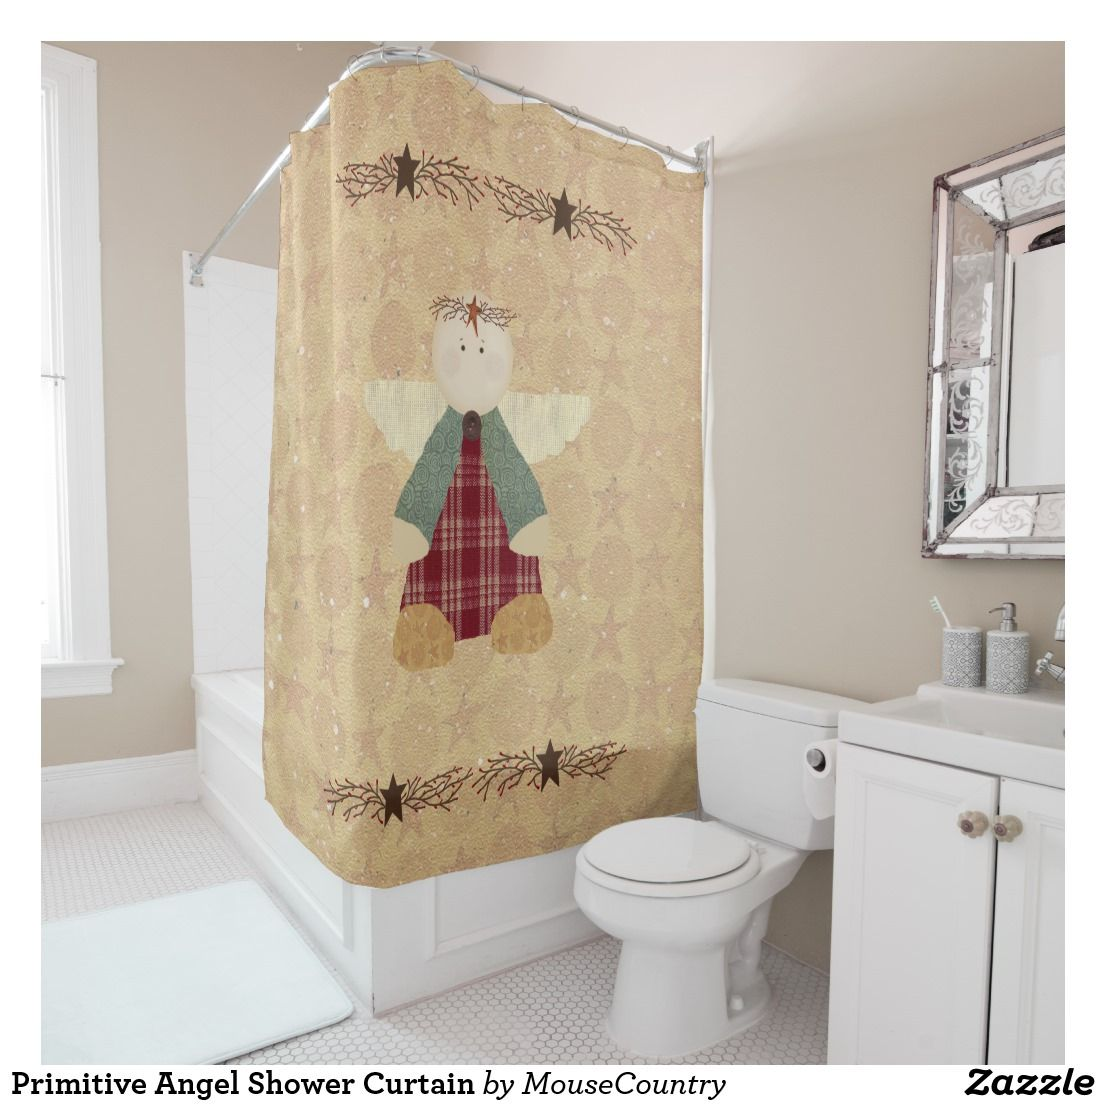 Primitive Angel Shower Curtain | Bath:Shower Curtains | Pinterest ...